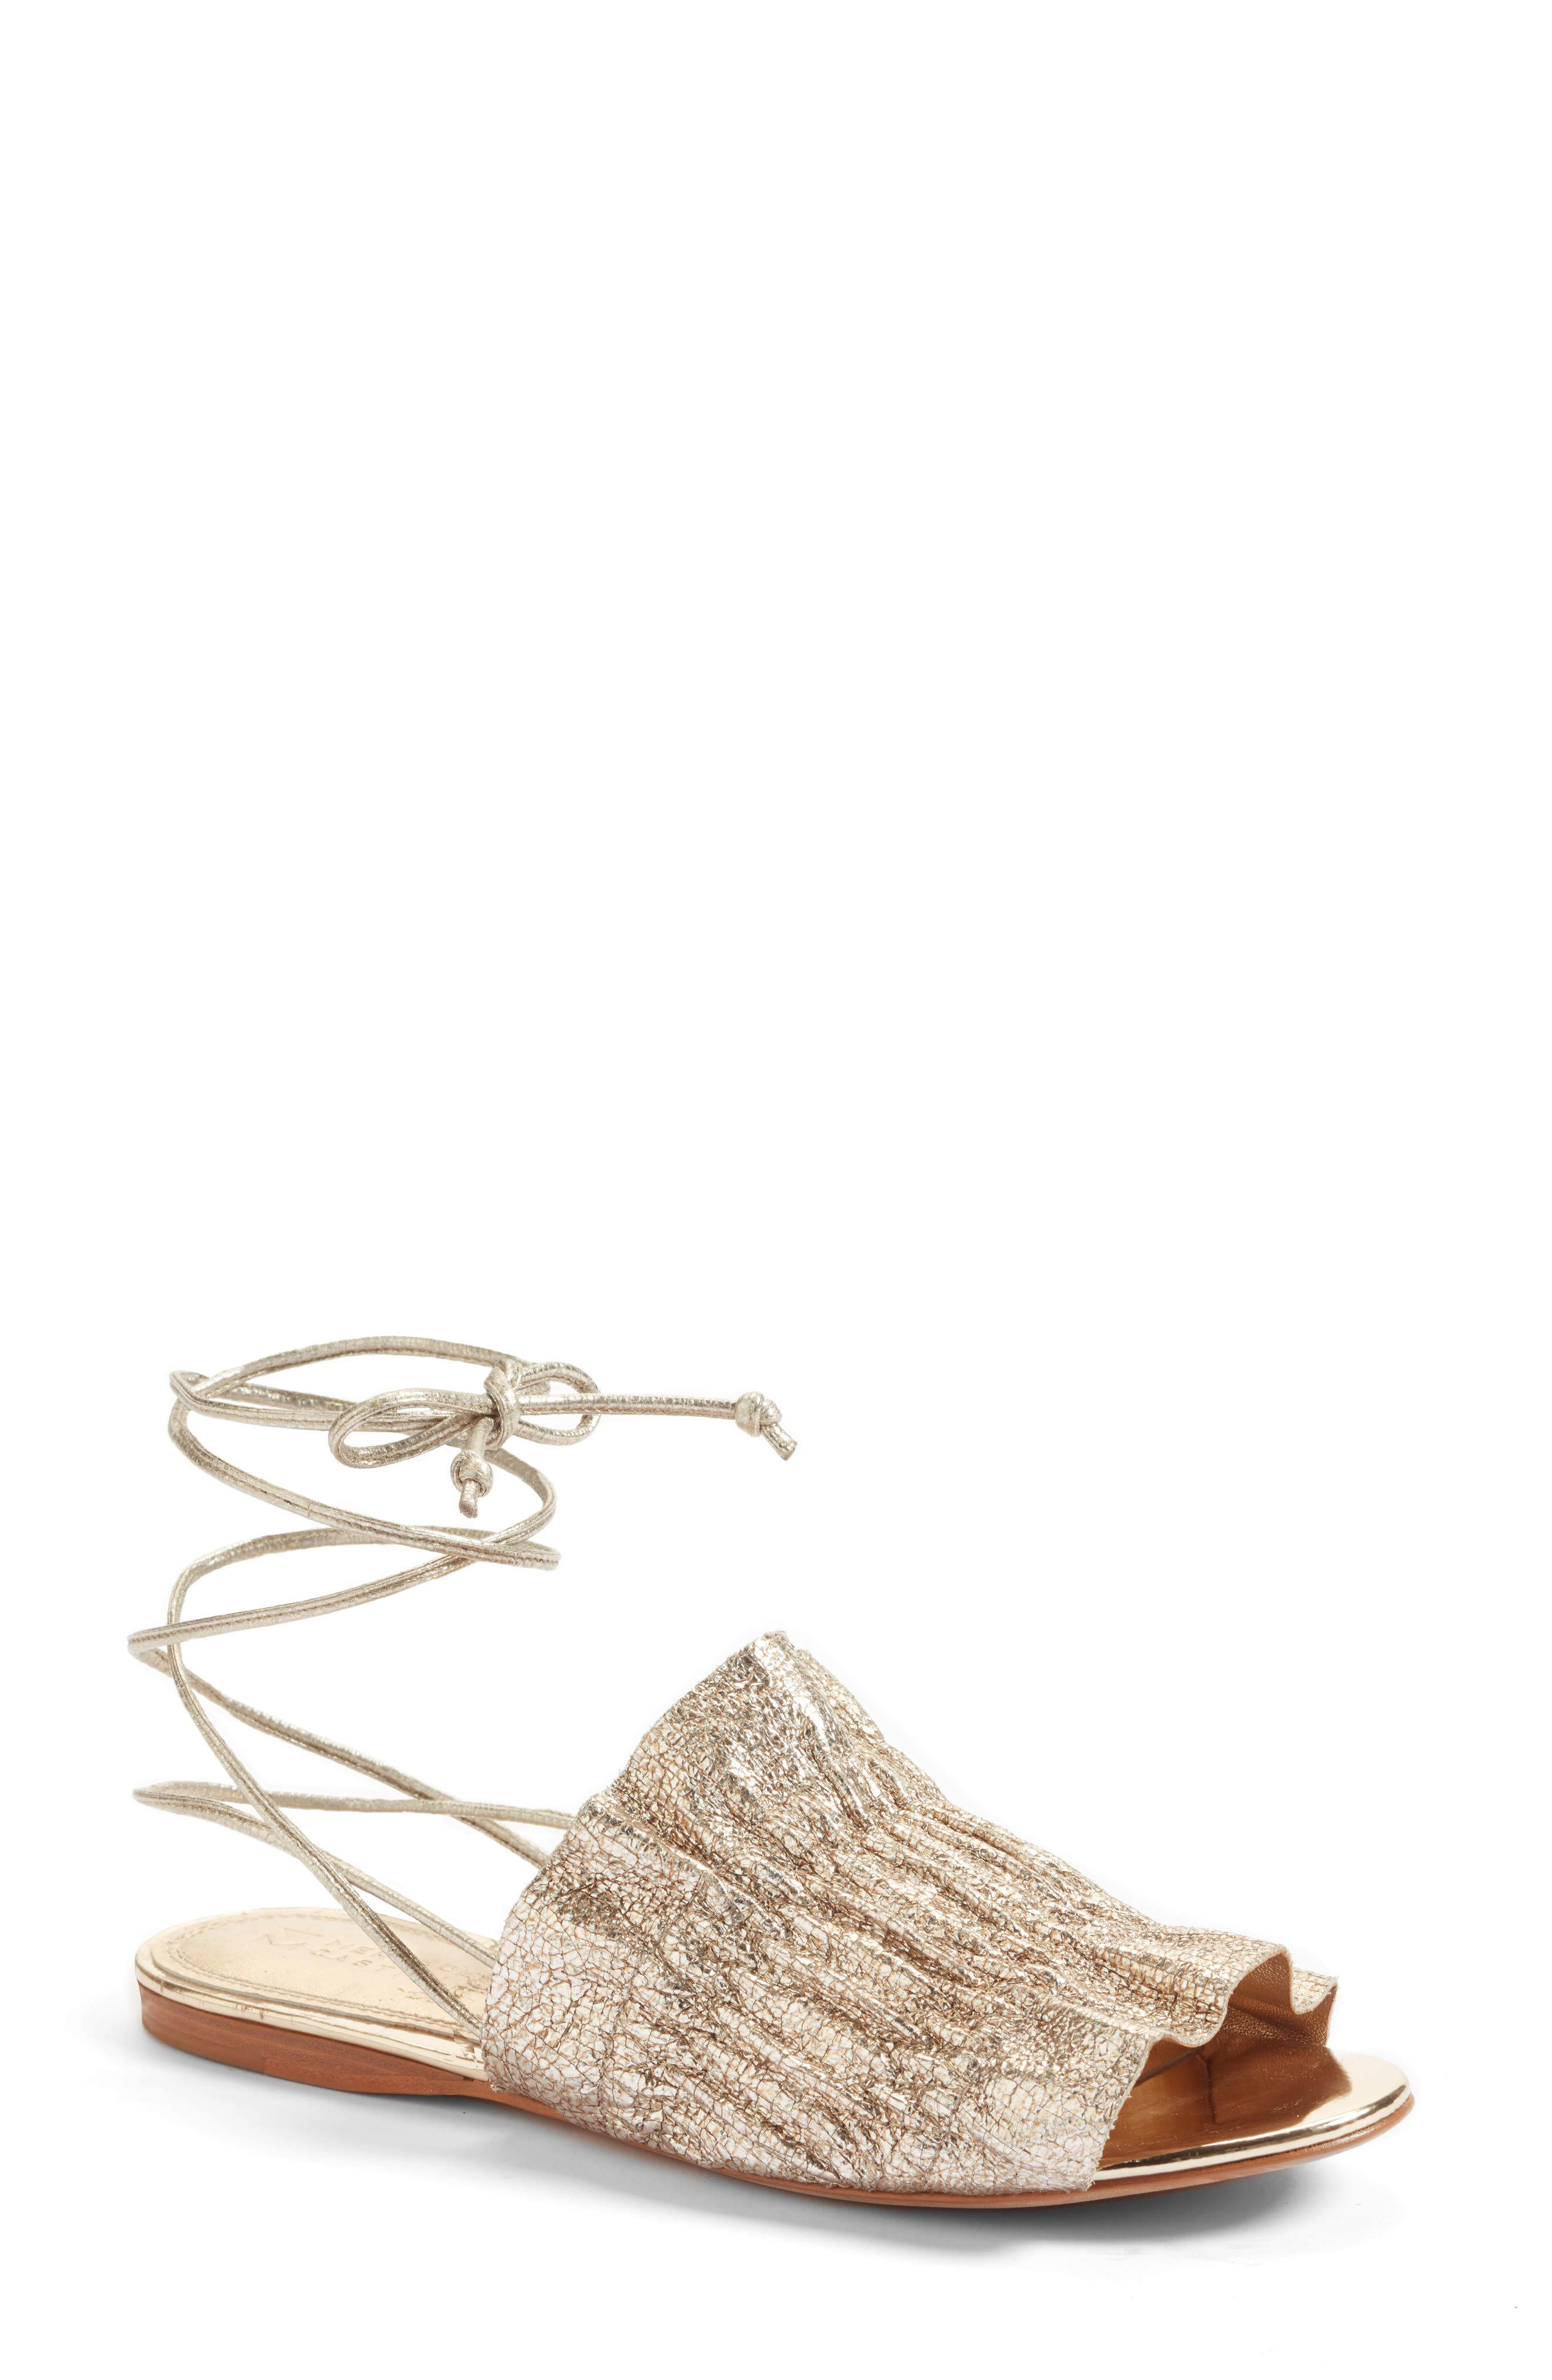 Alesandra Sandal,                         Main,                         color, Platino Leather